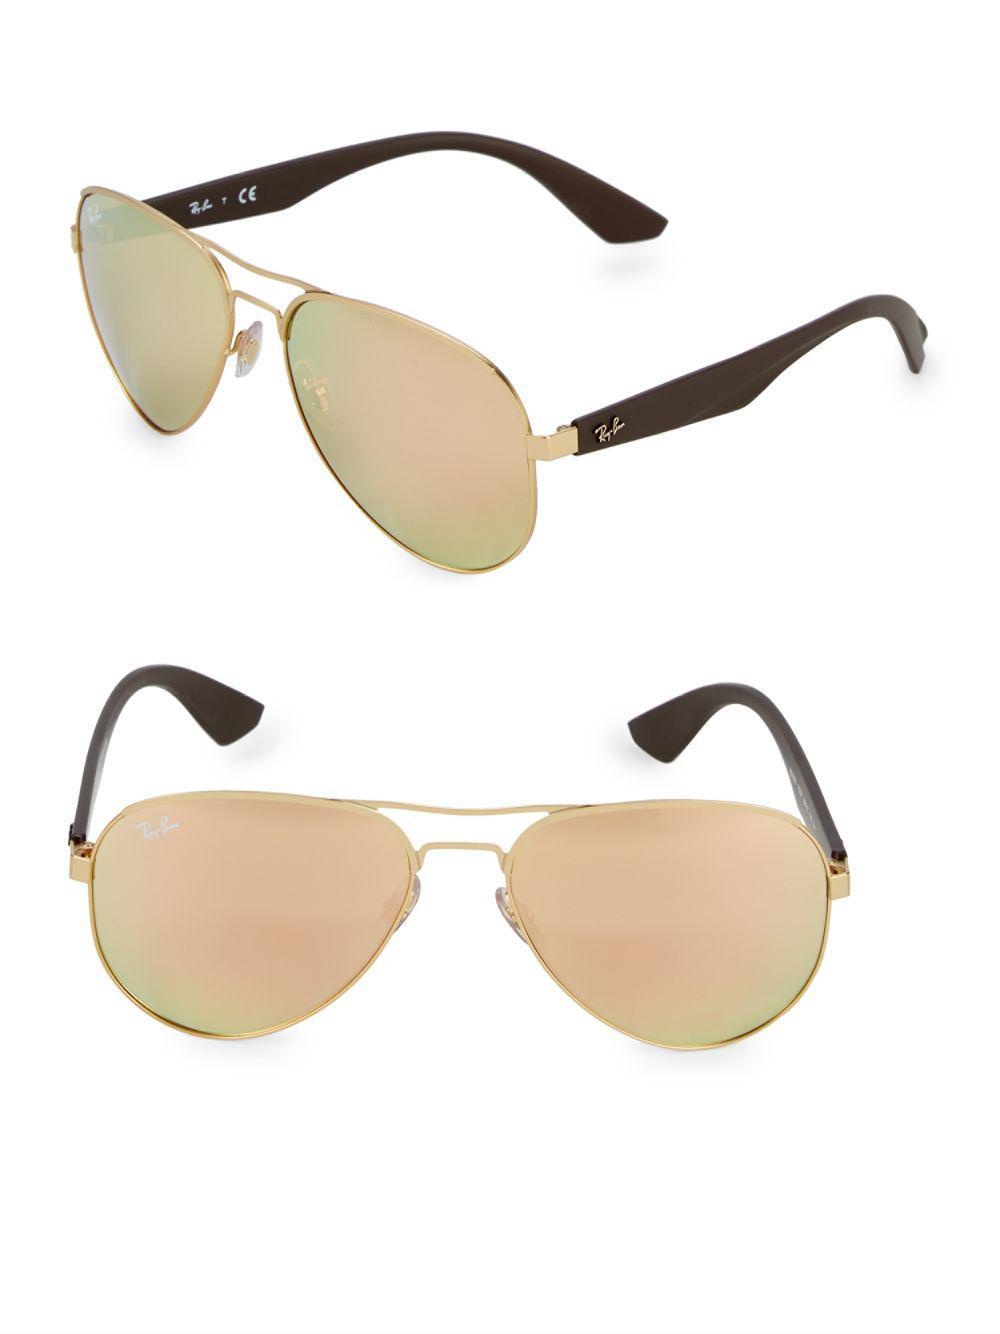 22faa489386 Lyst - Ray-Ban 59mm Aviator Sunglasses in Brown